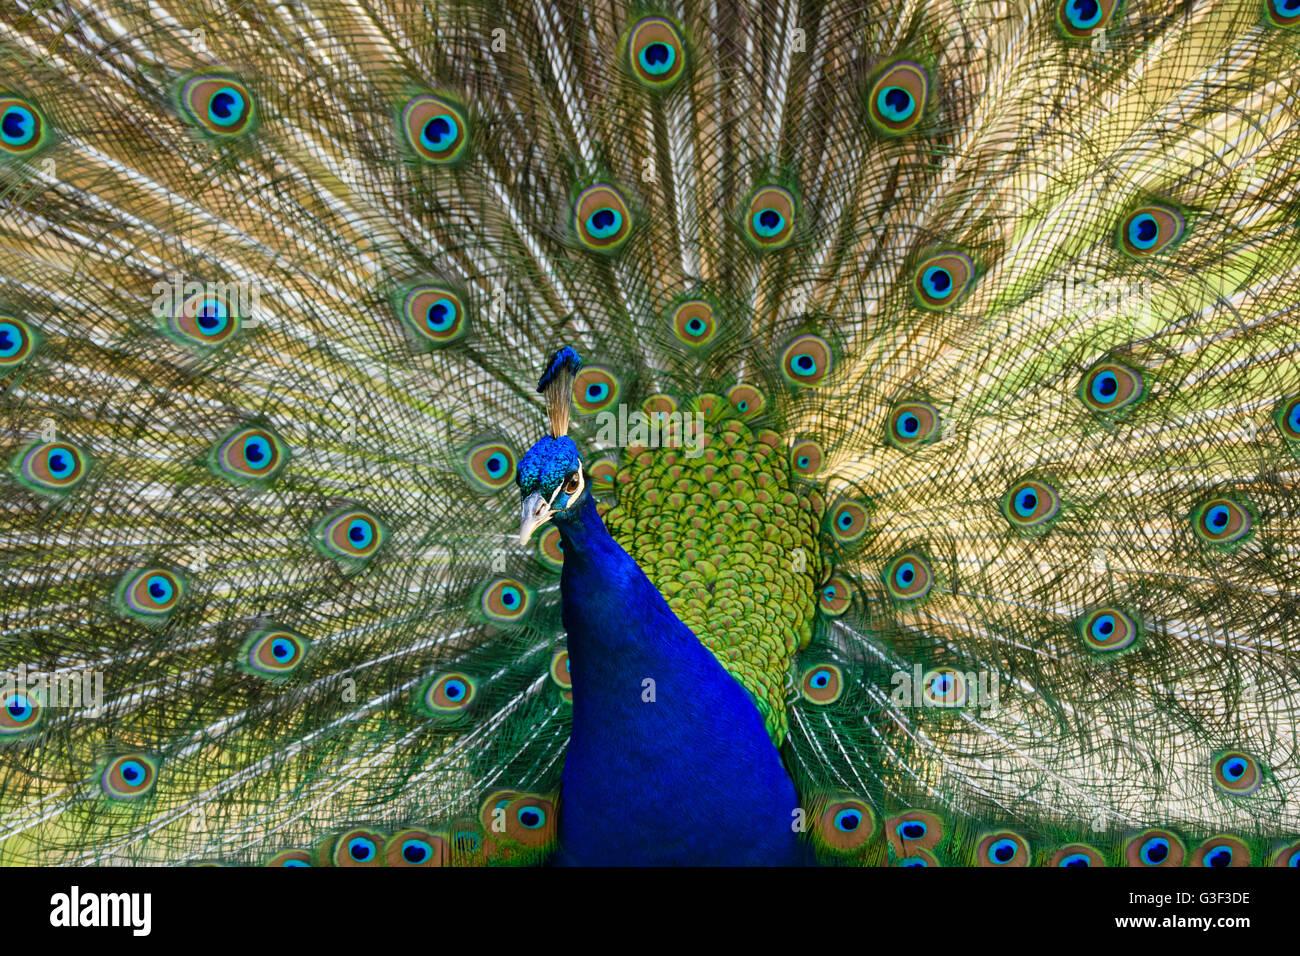 Peacock, Pavo muticus, Hesse, Germany - Stock Image